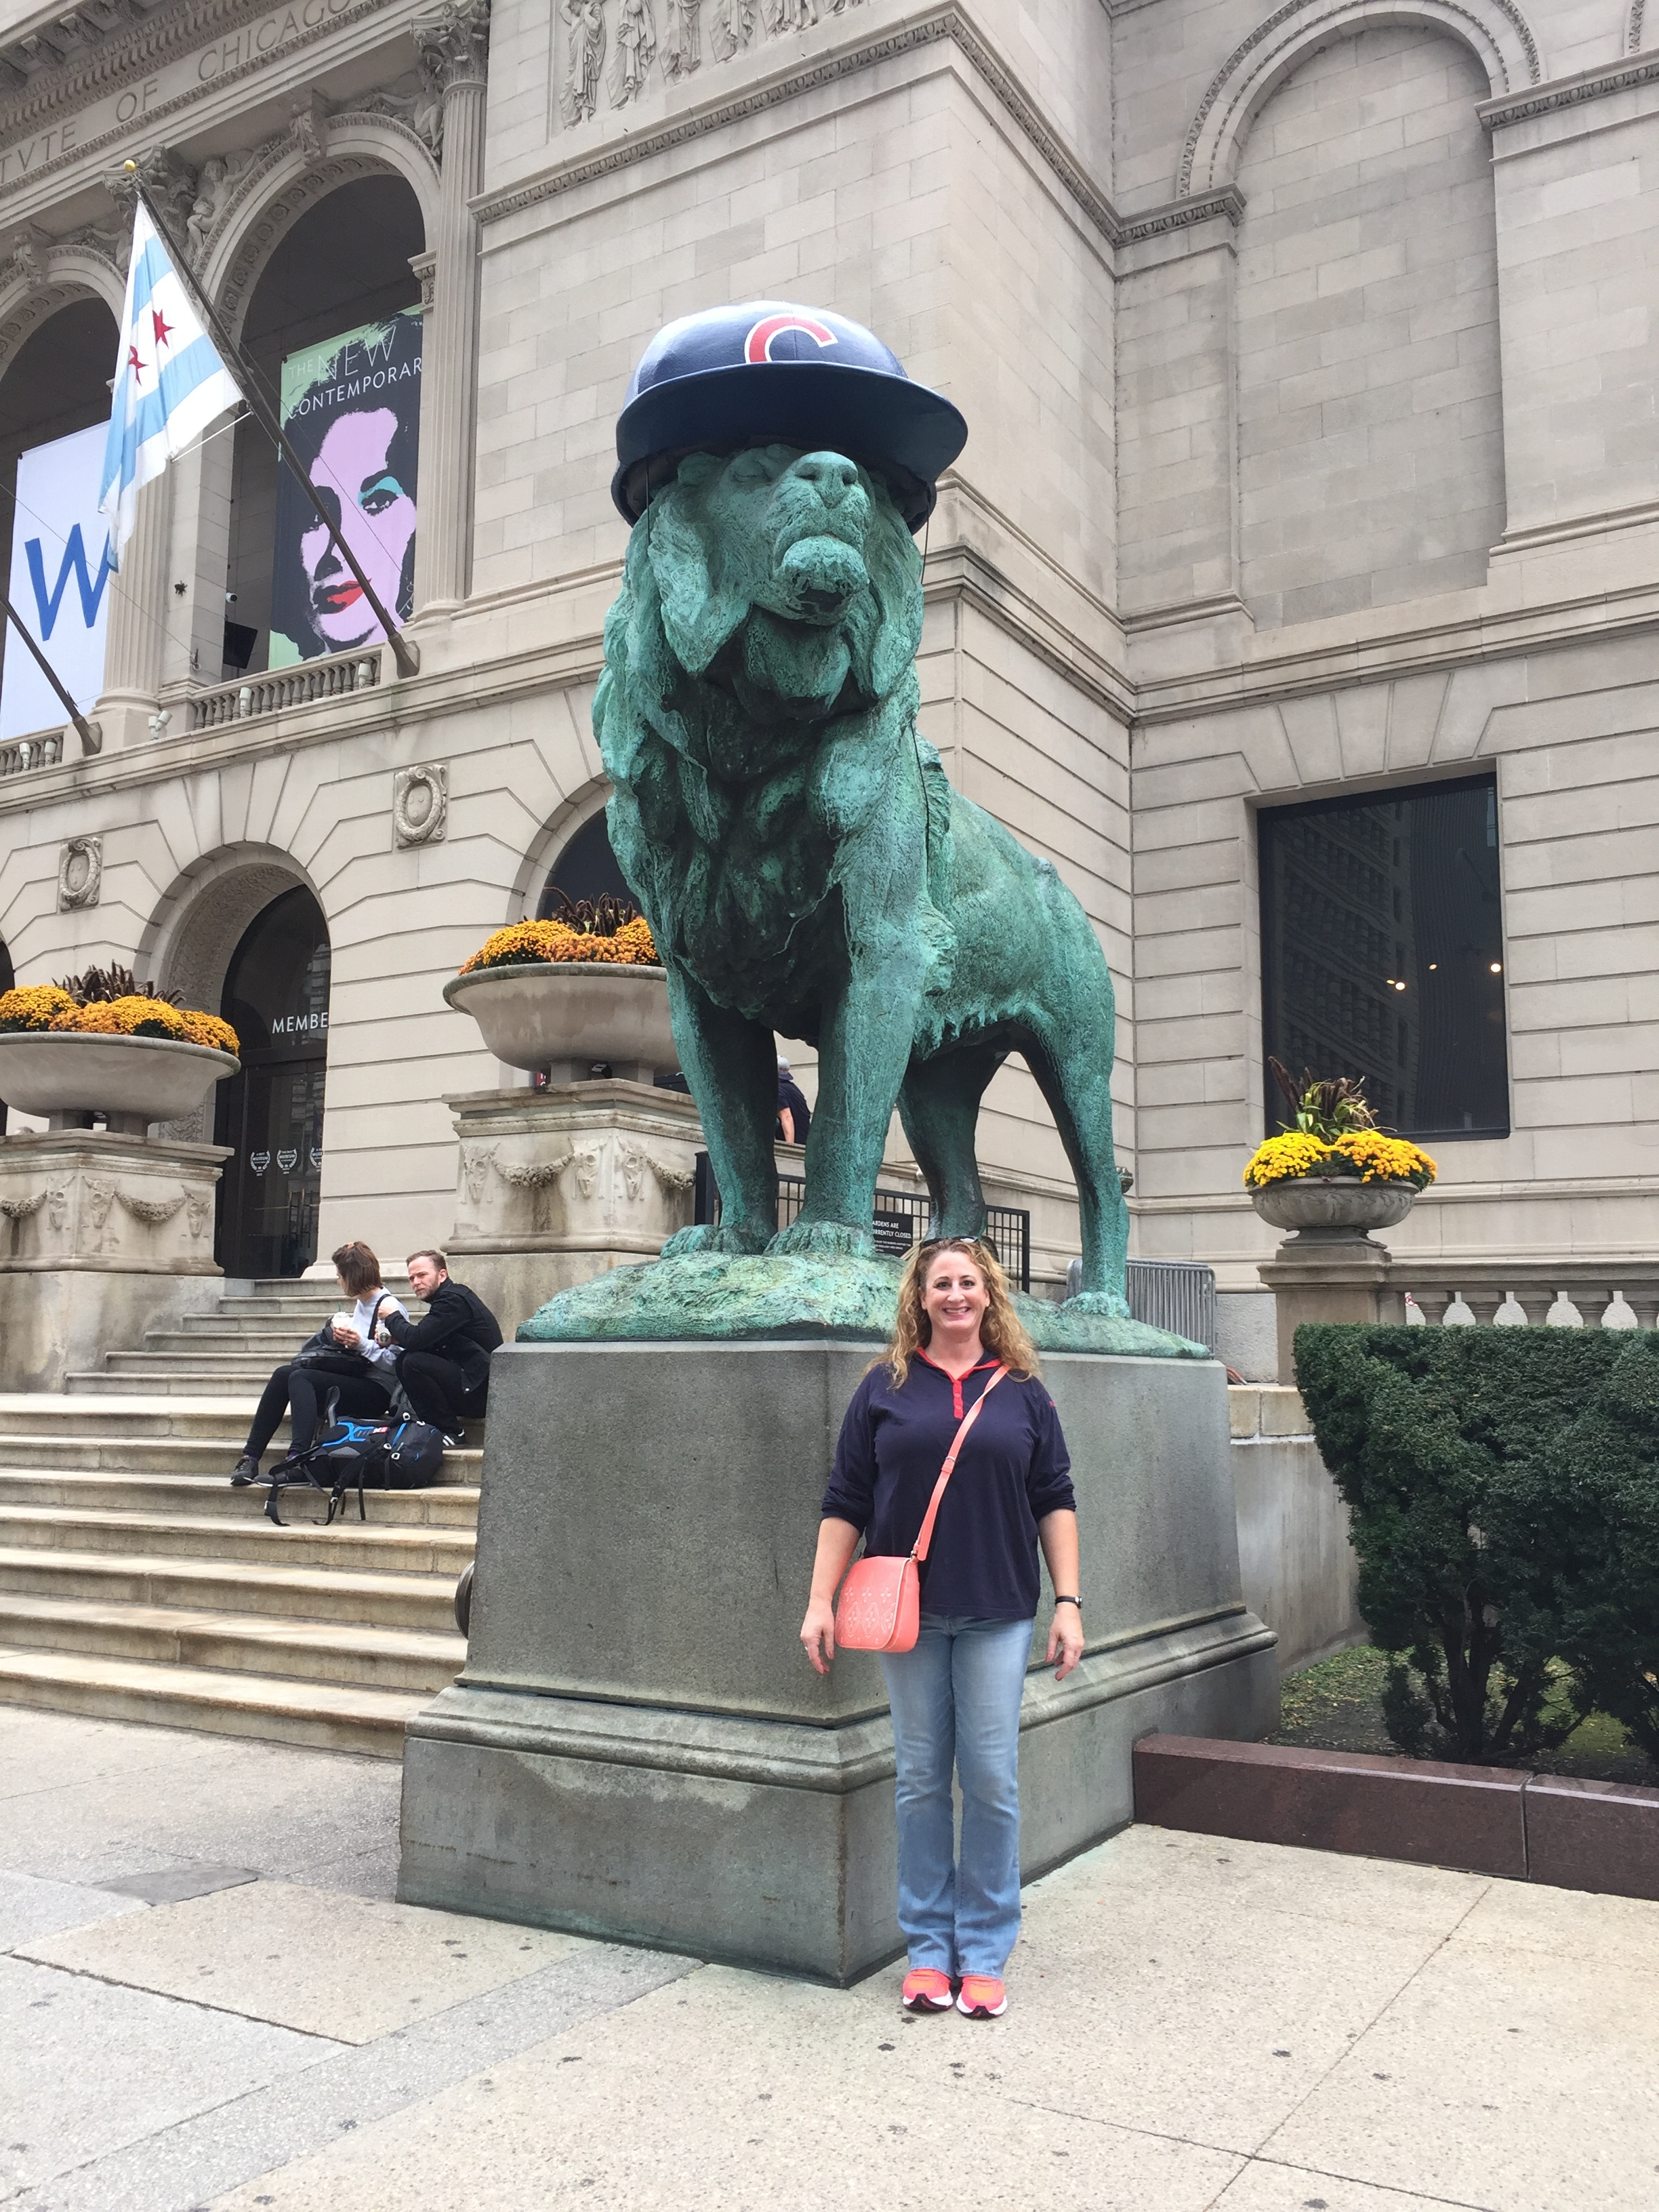 Visiting the Art Instititute in Chicago